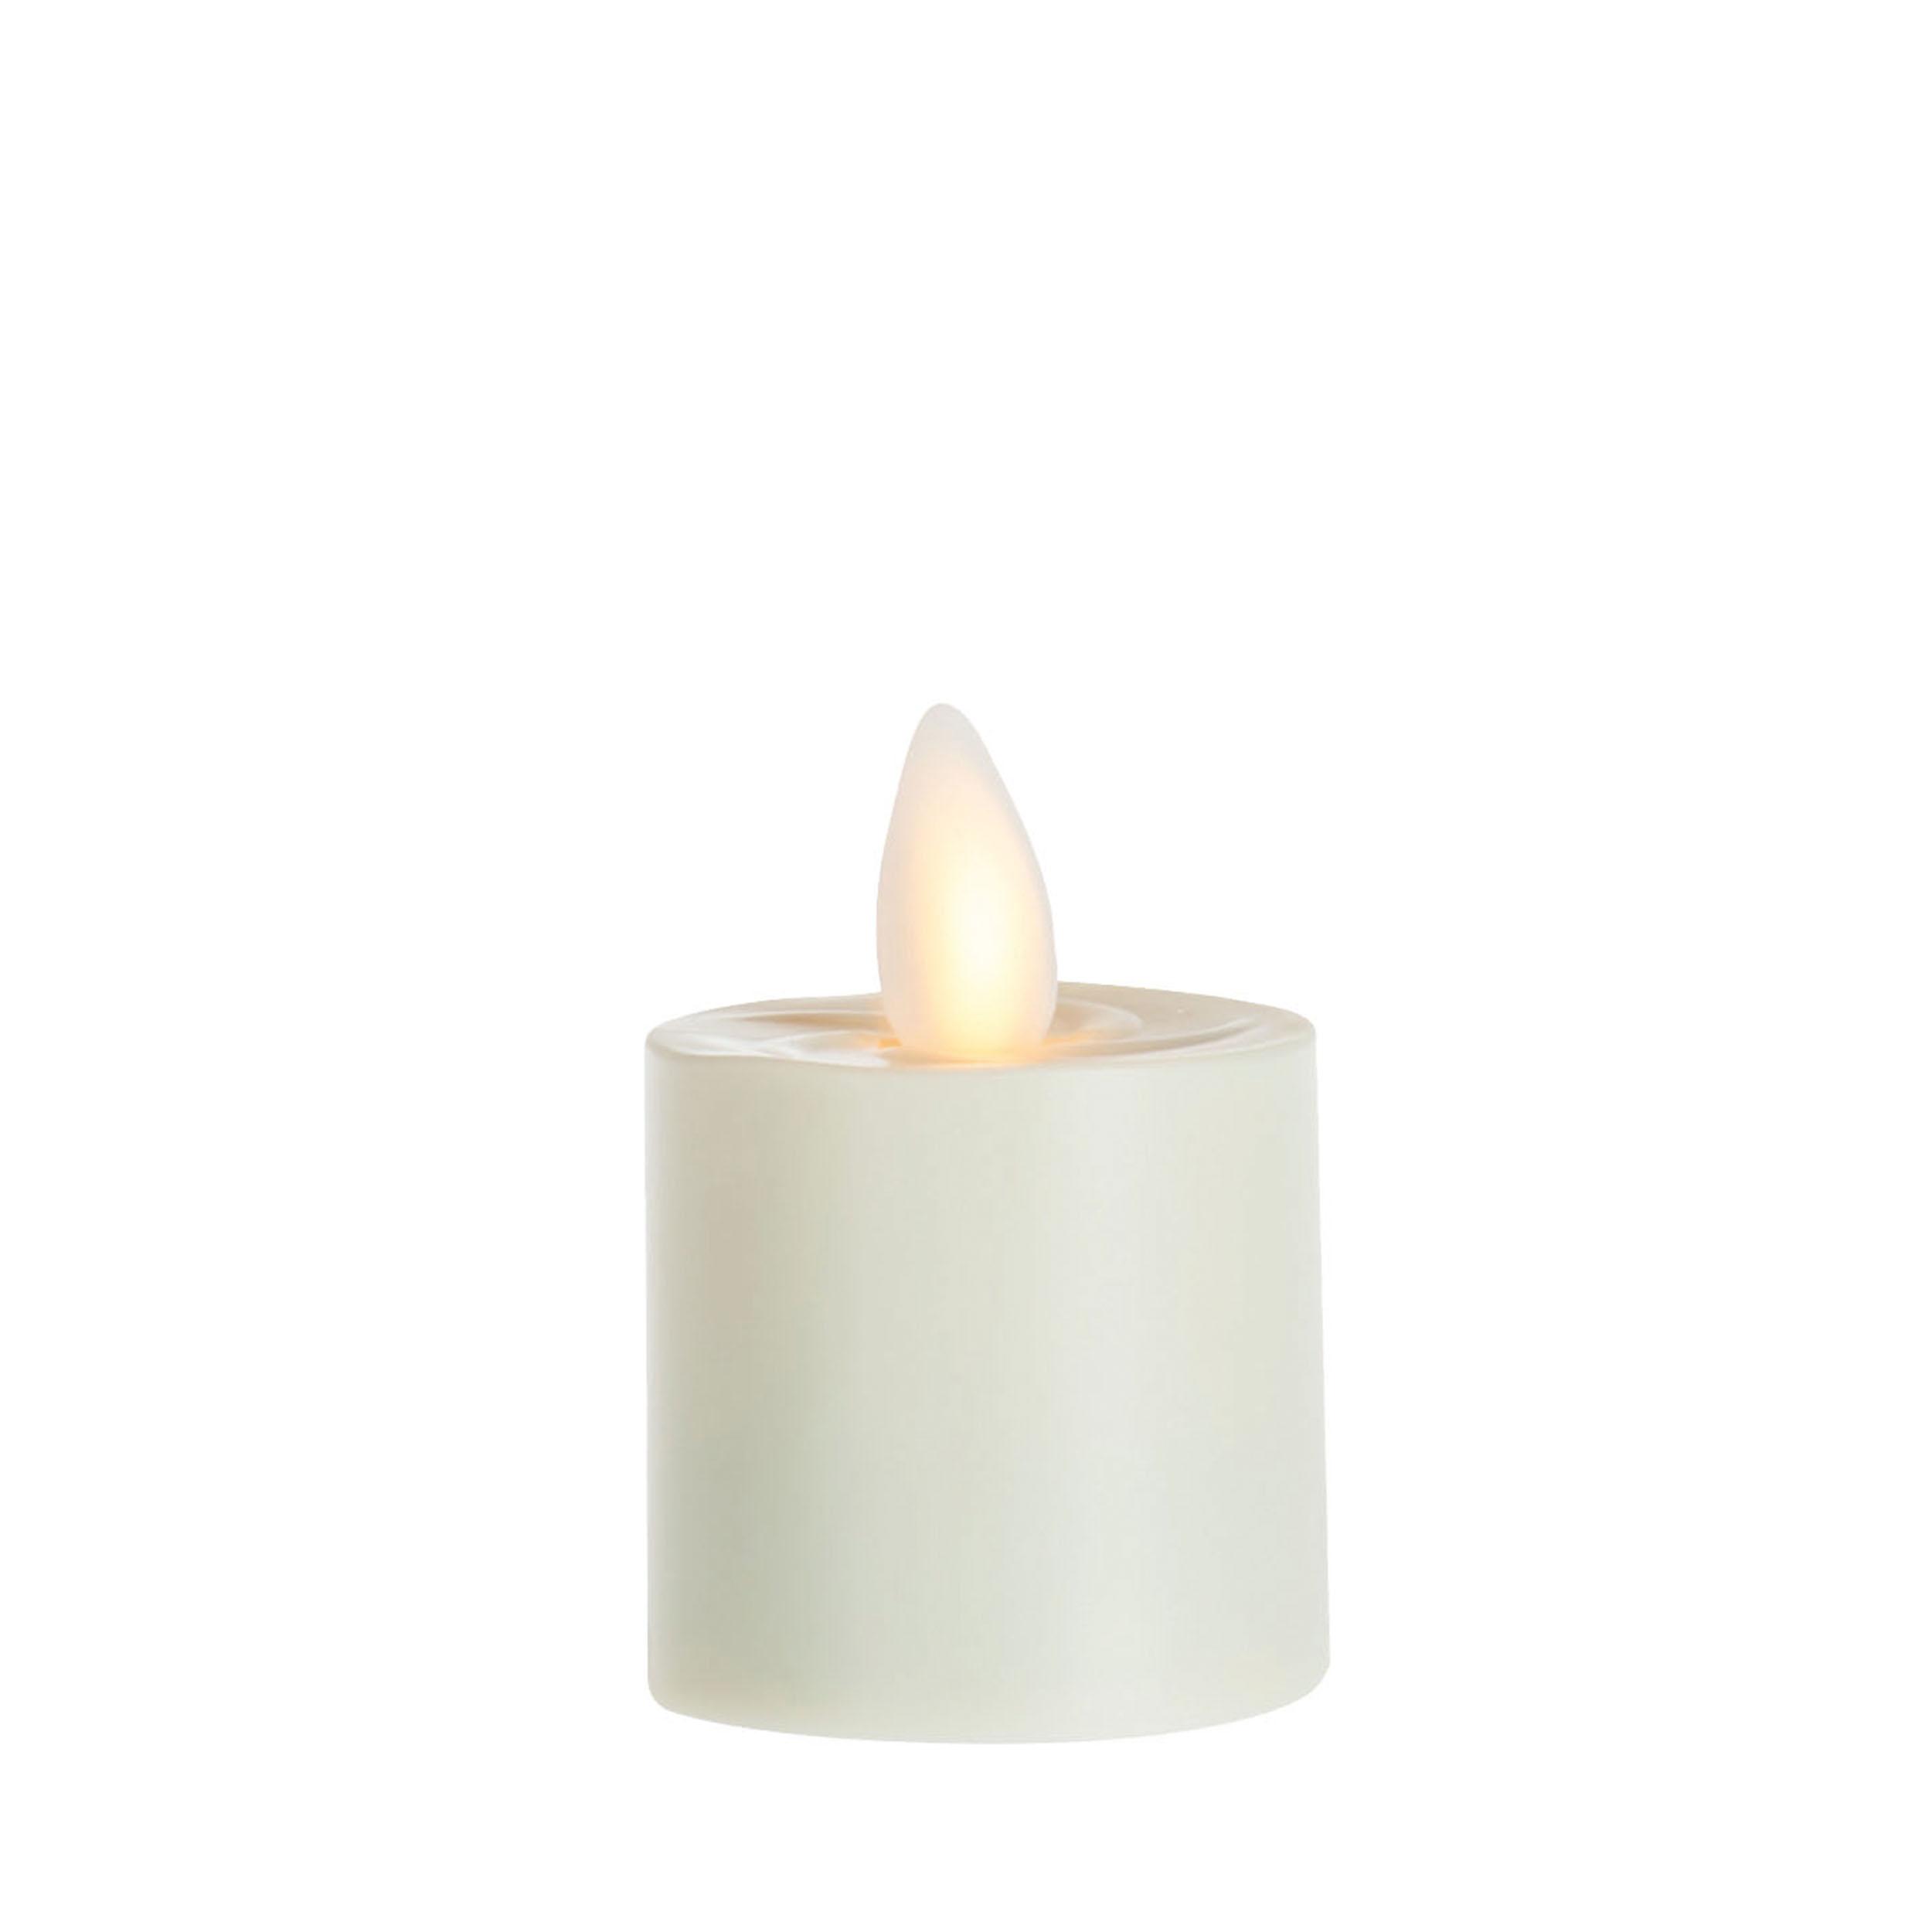 Flame LED Teelicht